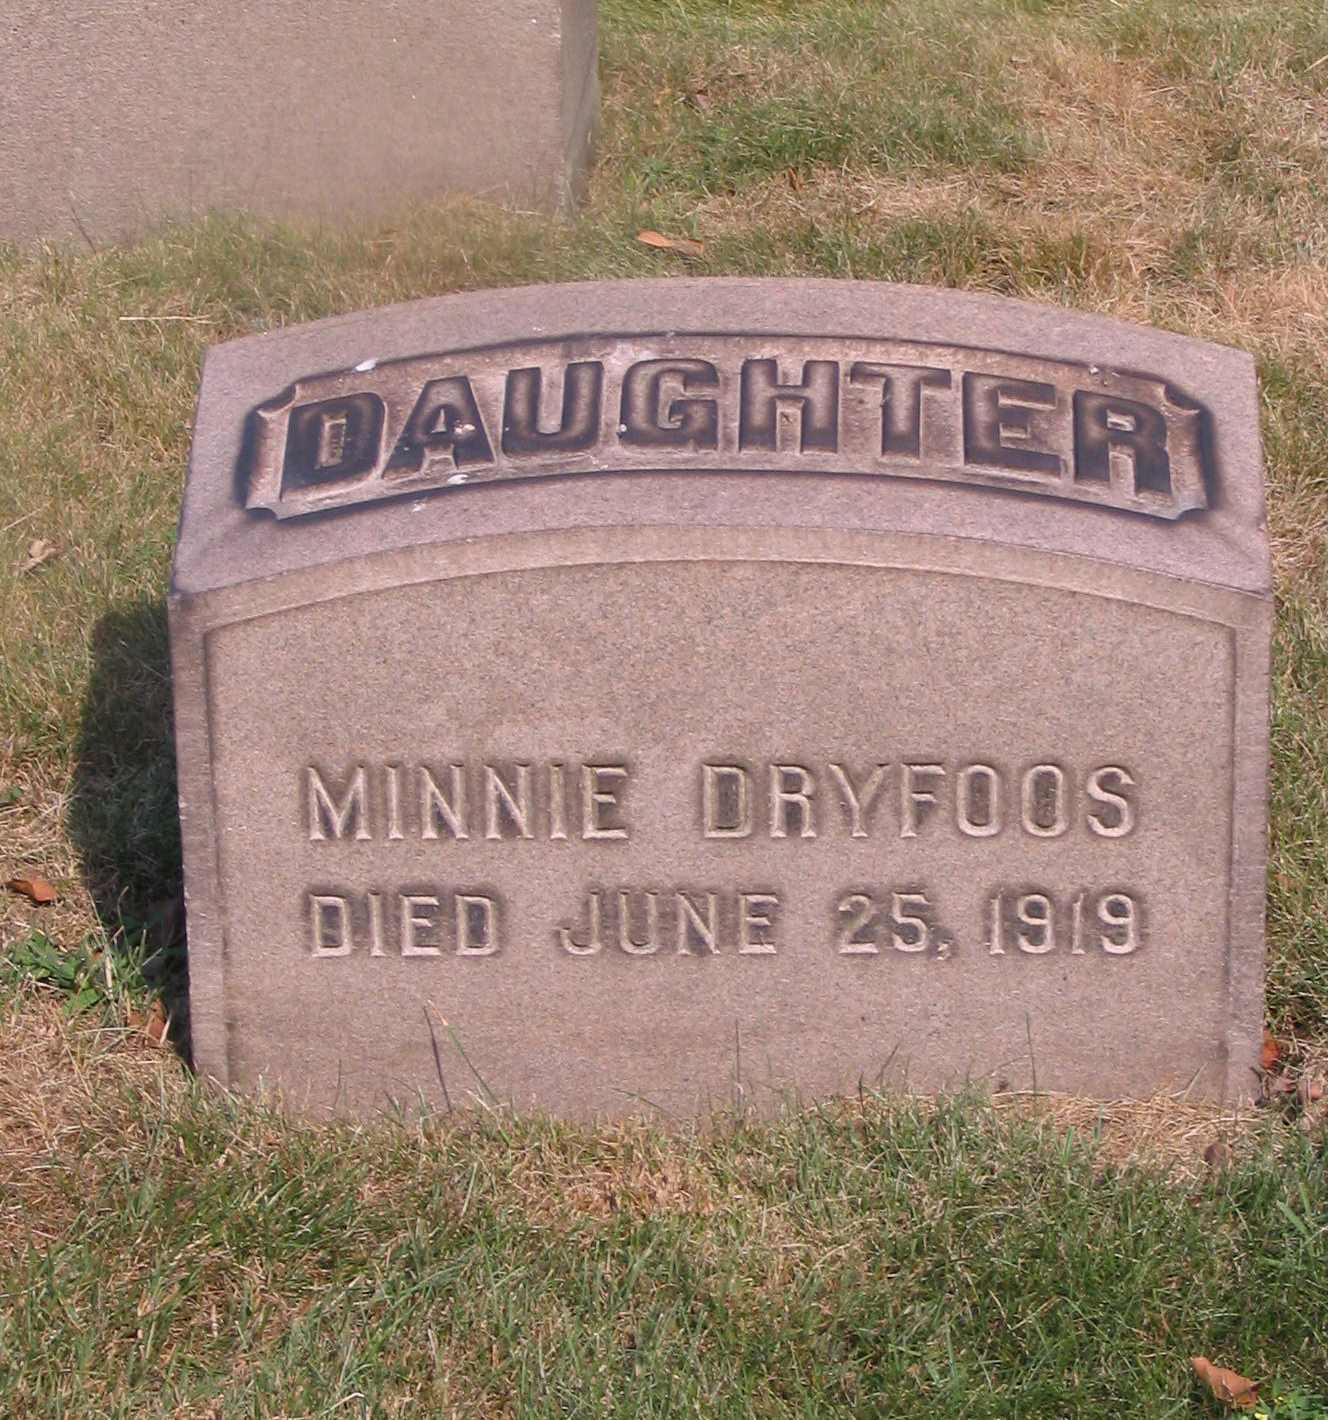 Minnie Dryfoos